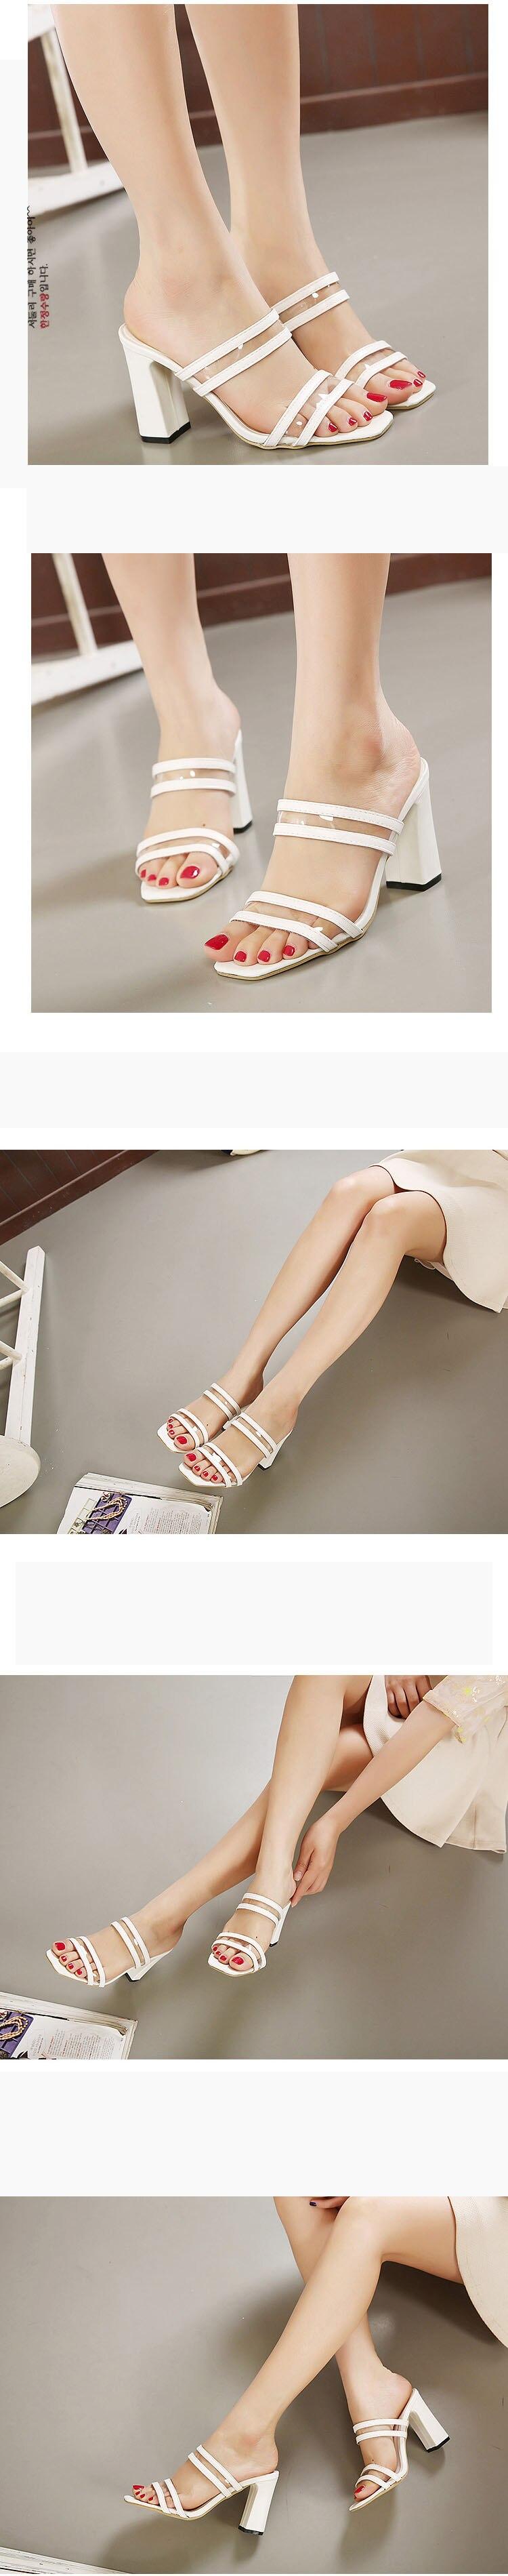 HTB1p2Dah4TI8KJjSspiq6zM4FXaG Eilyken Summer Fashion Woman Sandals Shallow Rome Mouth Female Casual Square heel Ladies thick Sandals Shoes White BLACK SIZE 40